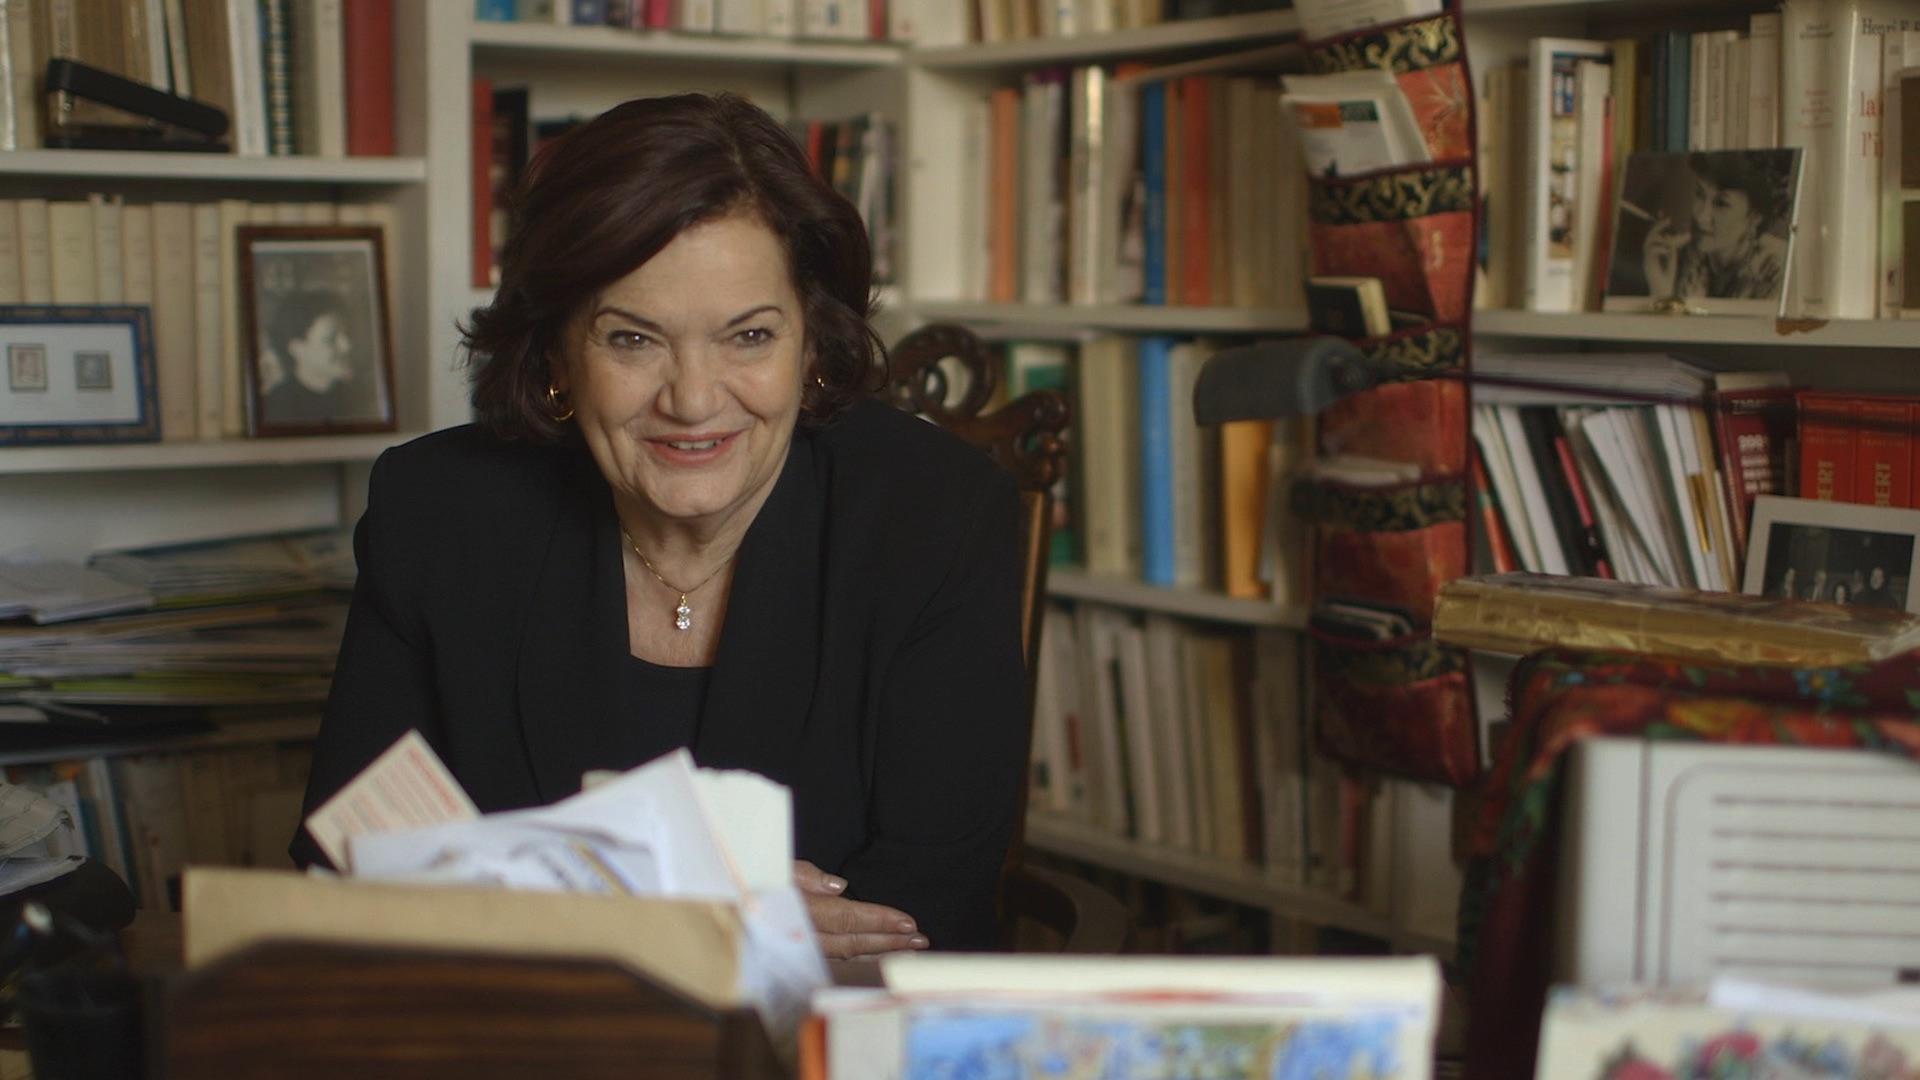 Elisabeth Roudinesco, libre et engagée - Blandine Armand - Documentaires